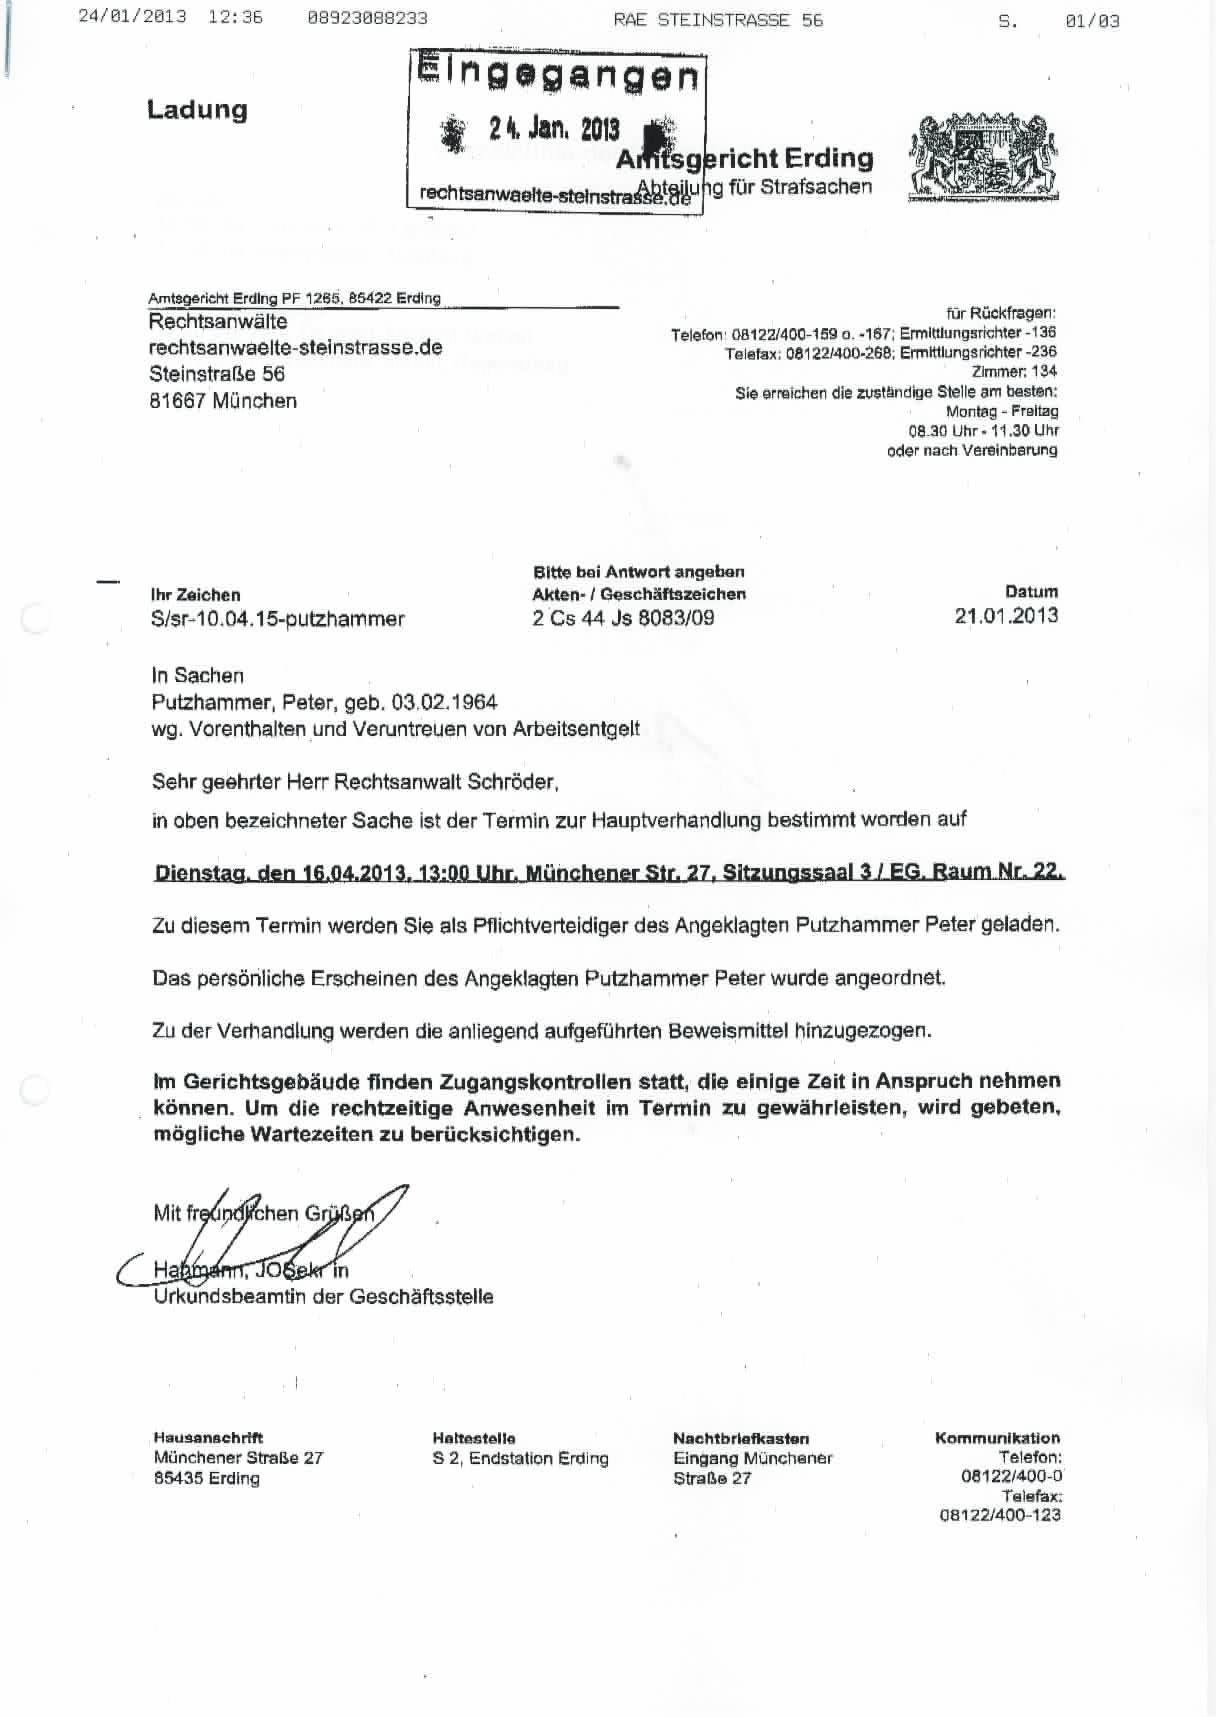 15 Anschreiben Amtsgericht Muster Dosequisseries Com